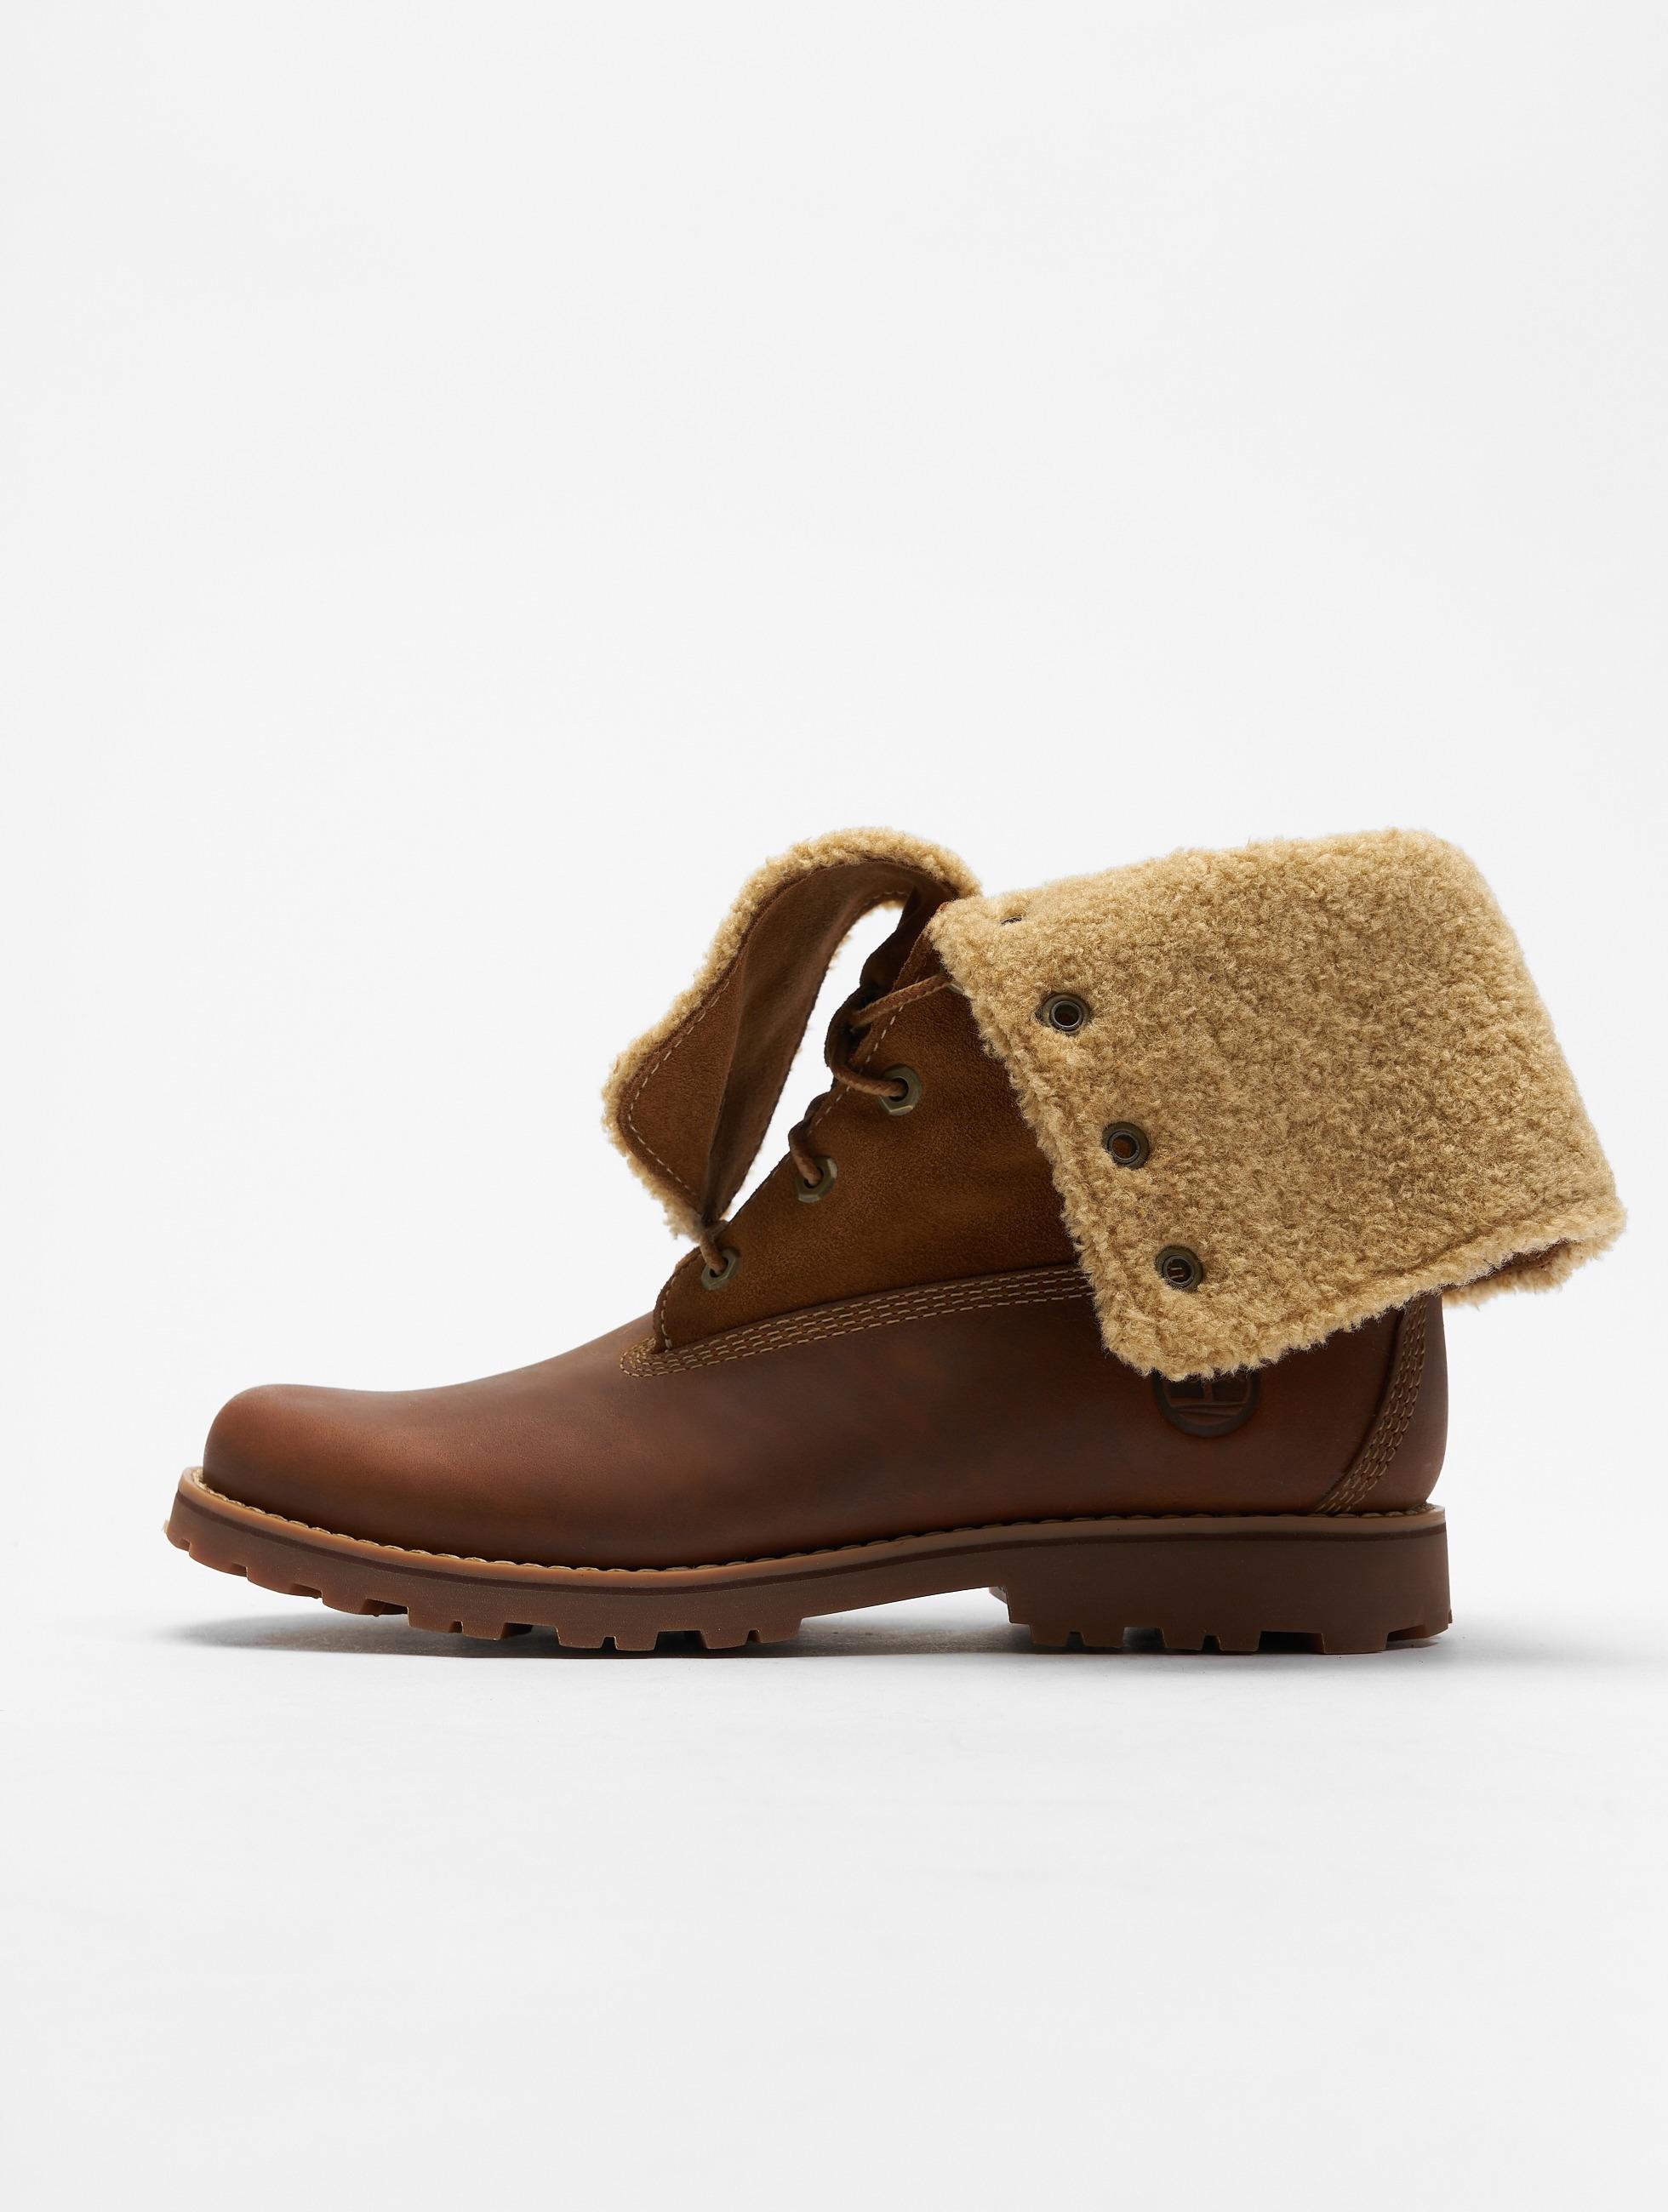 Timberland Ботинки Authentics 6 In Shearling коричневый